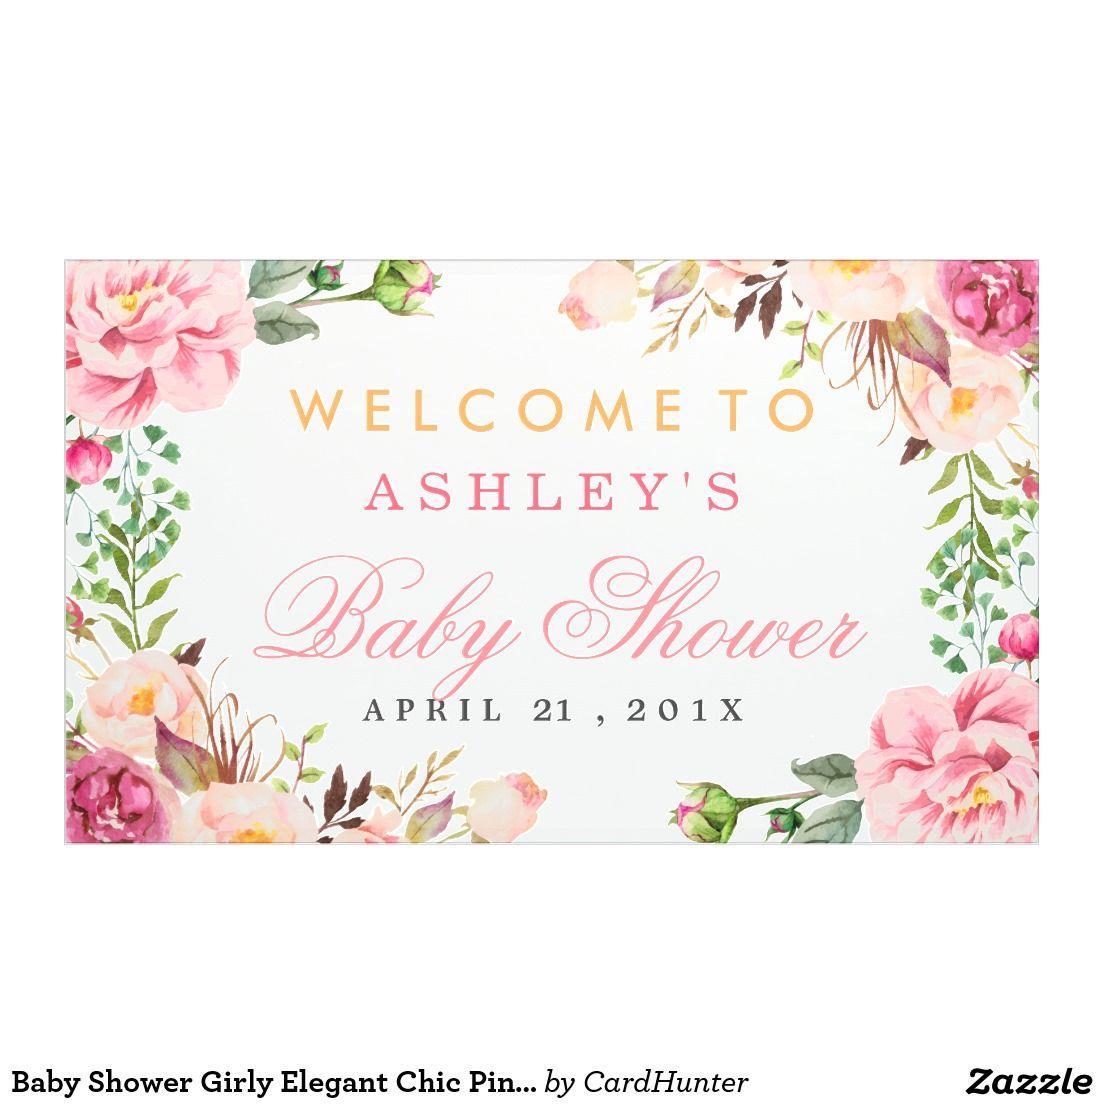 Baby Shower Girly Elegant Chic Pink Floral Banner | Baby Shower ...